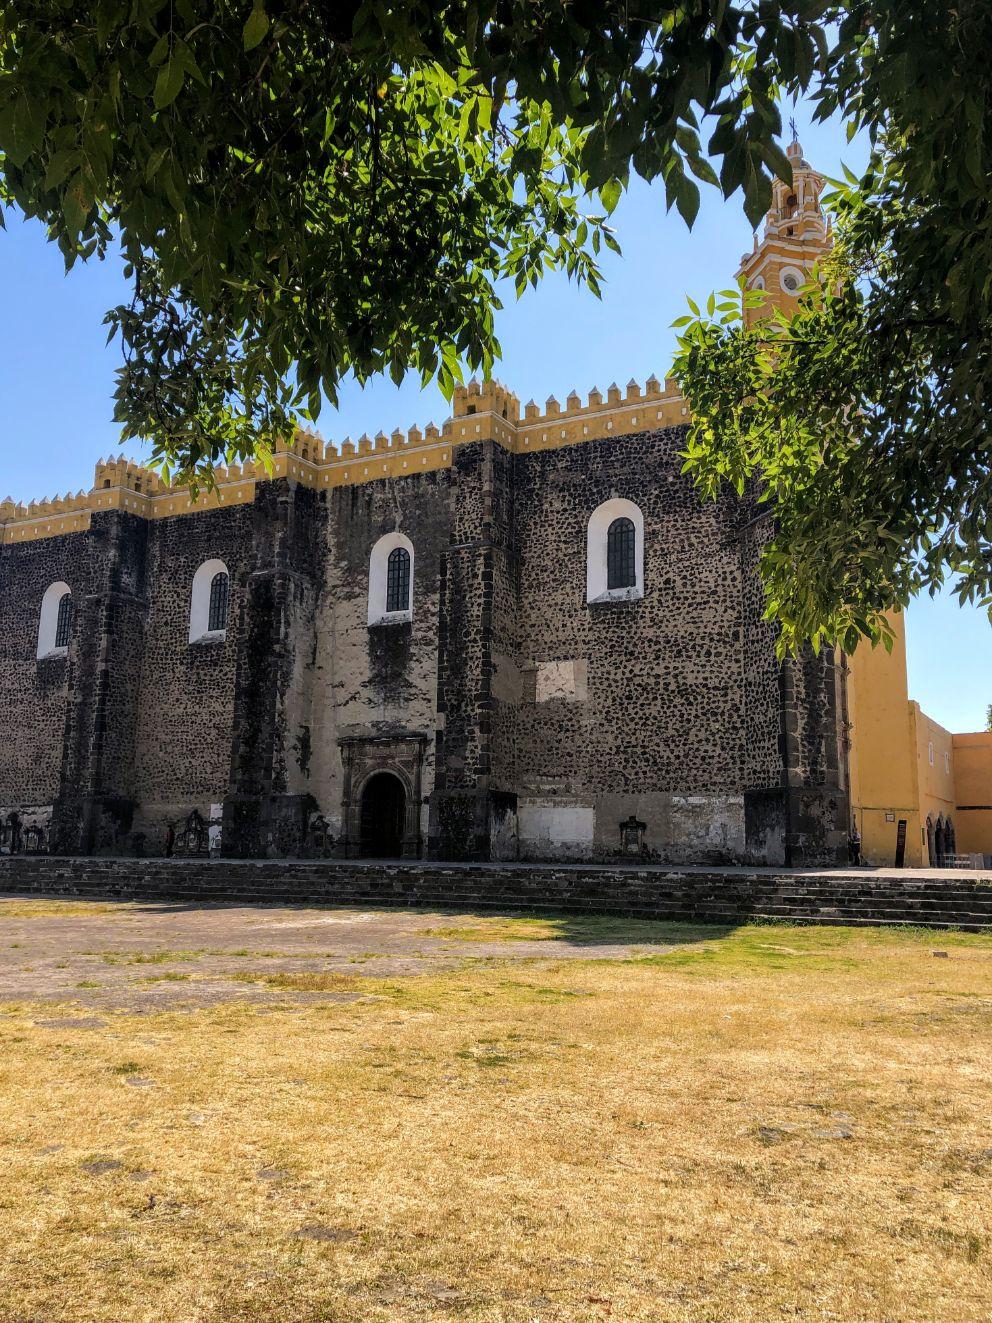 San Gabriel Convent in Cholula, Mexico